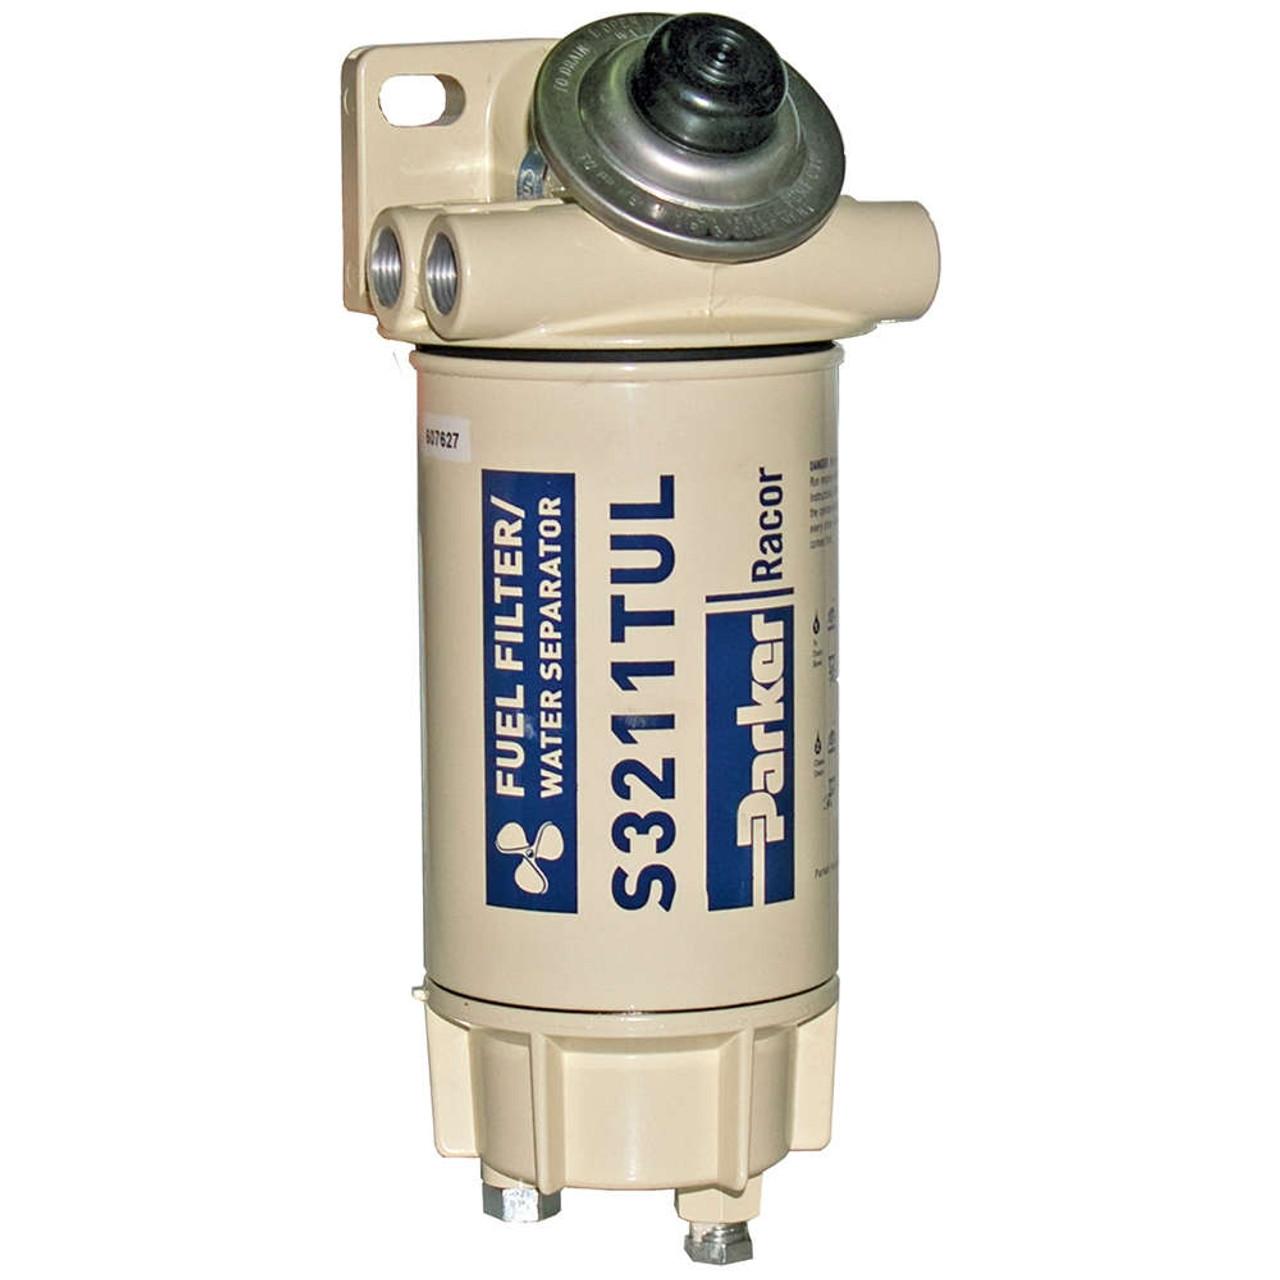 racor aquabloc marine 3 8 in 60 gph spin on diesel fuel filter water separator assembly 6 qty john m ellsworth co inc  [ 1000 x 1000 Pixel ]